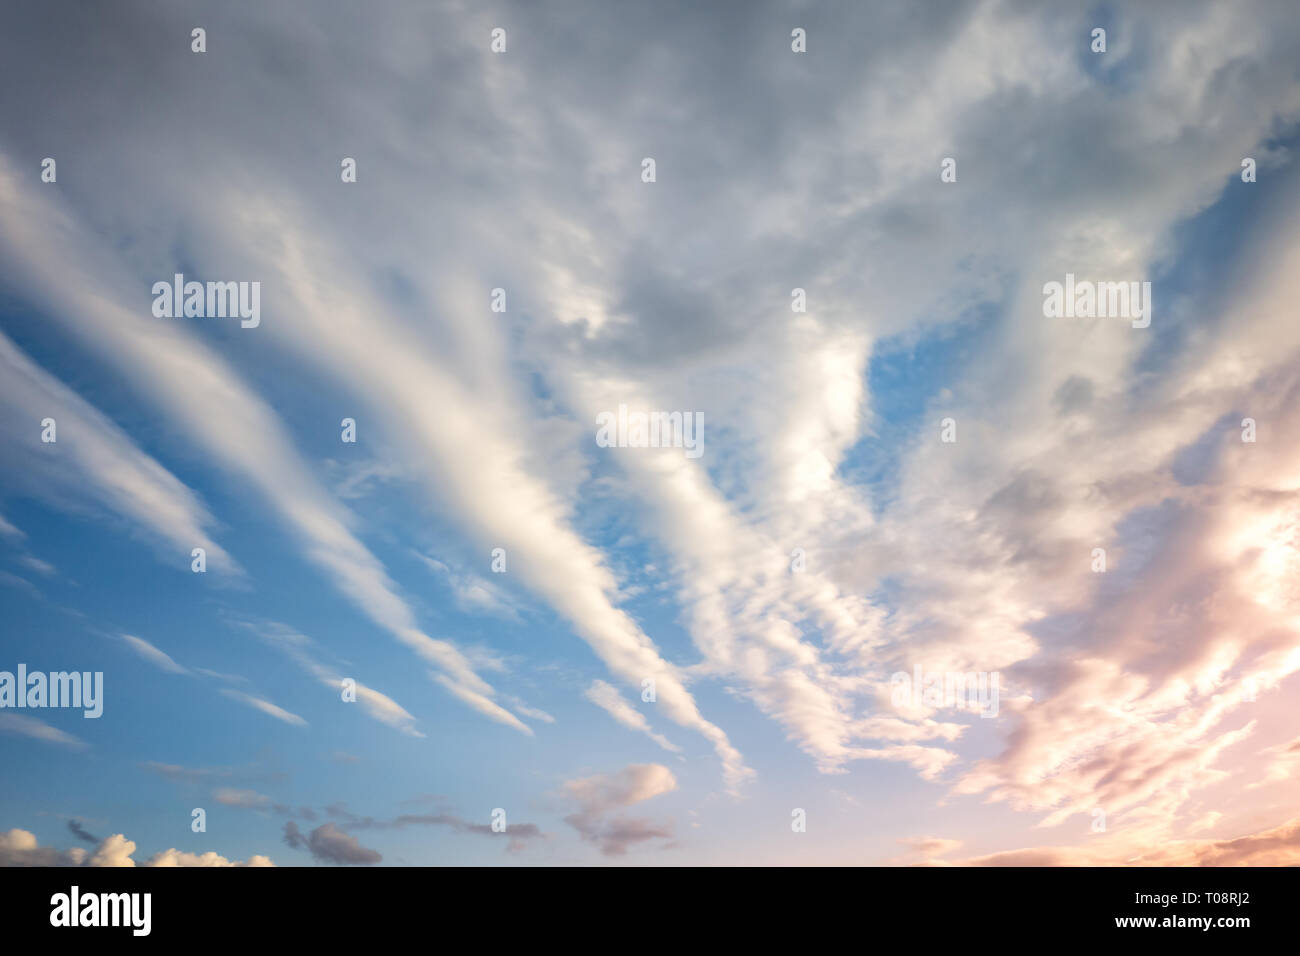 Hdri Stock Photos & Hdri Stock Images - Page 3 - Alamy